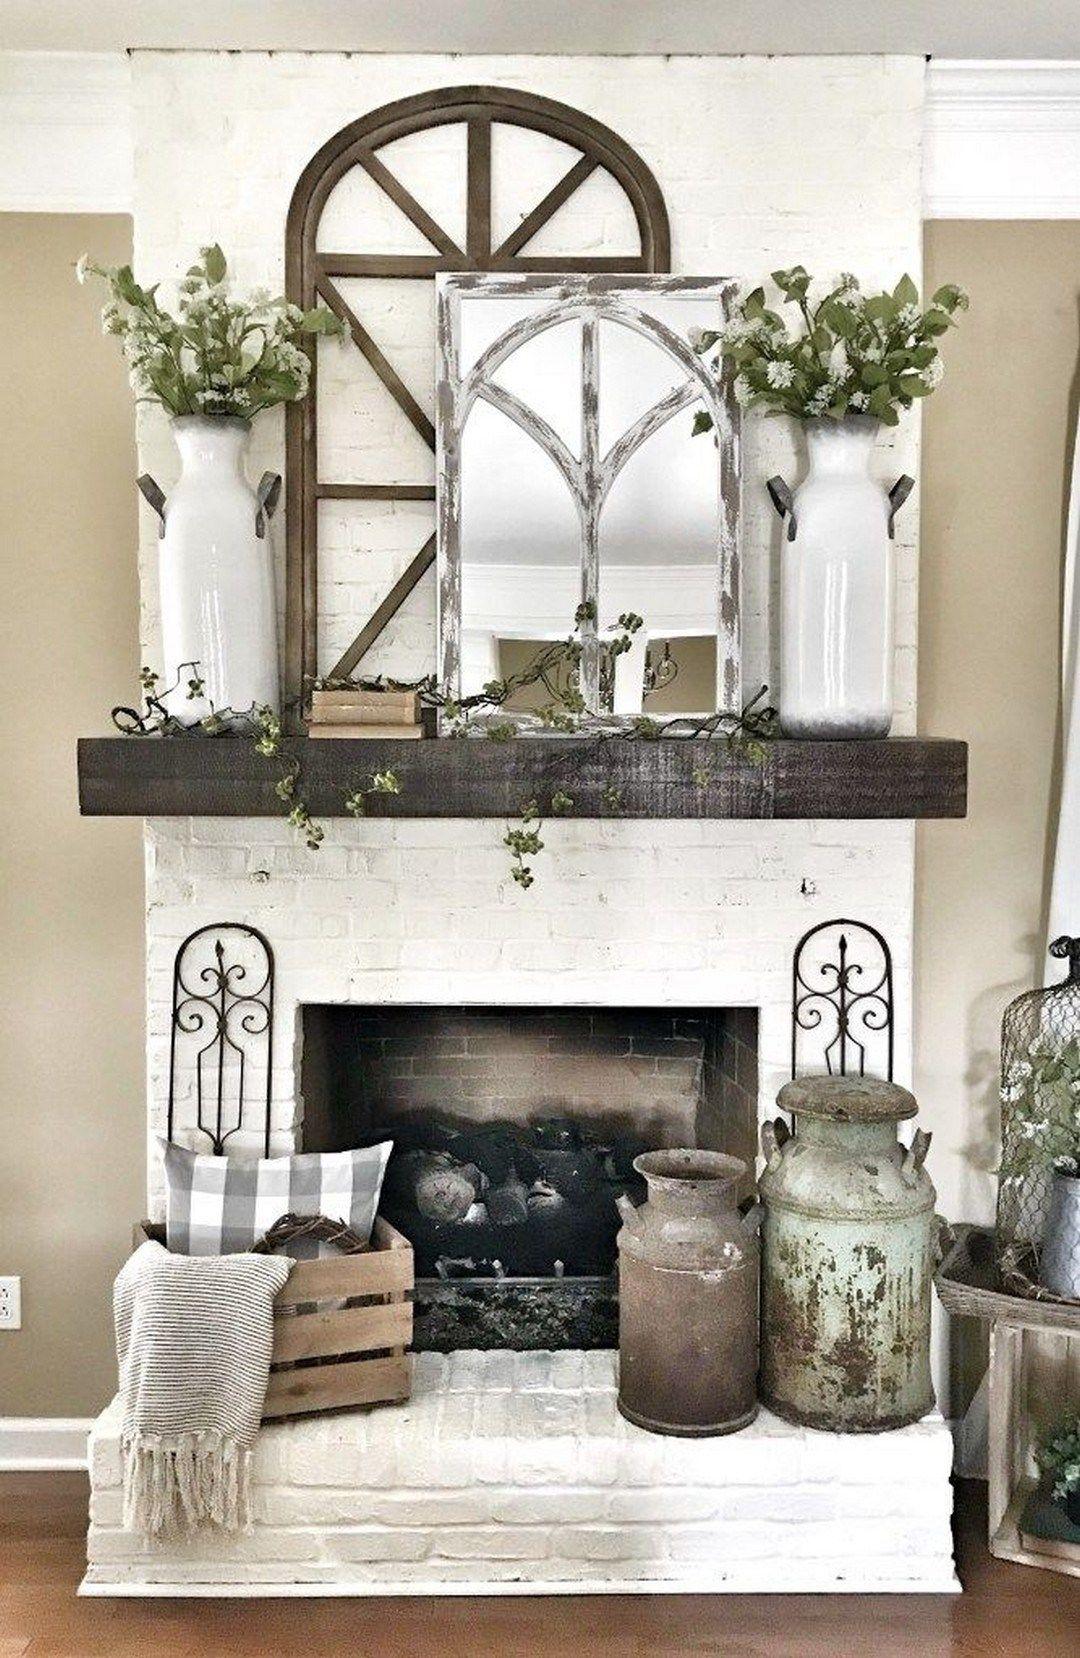 96 Beautiful Farmhouse Fireplace Mantel Decorations That Will Make Fireplace Mantle Decor Fireplace Mantel Decor Farmhouse Mantle Decor